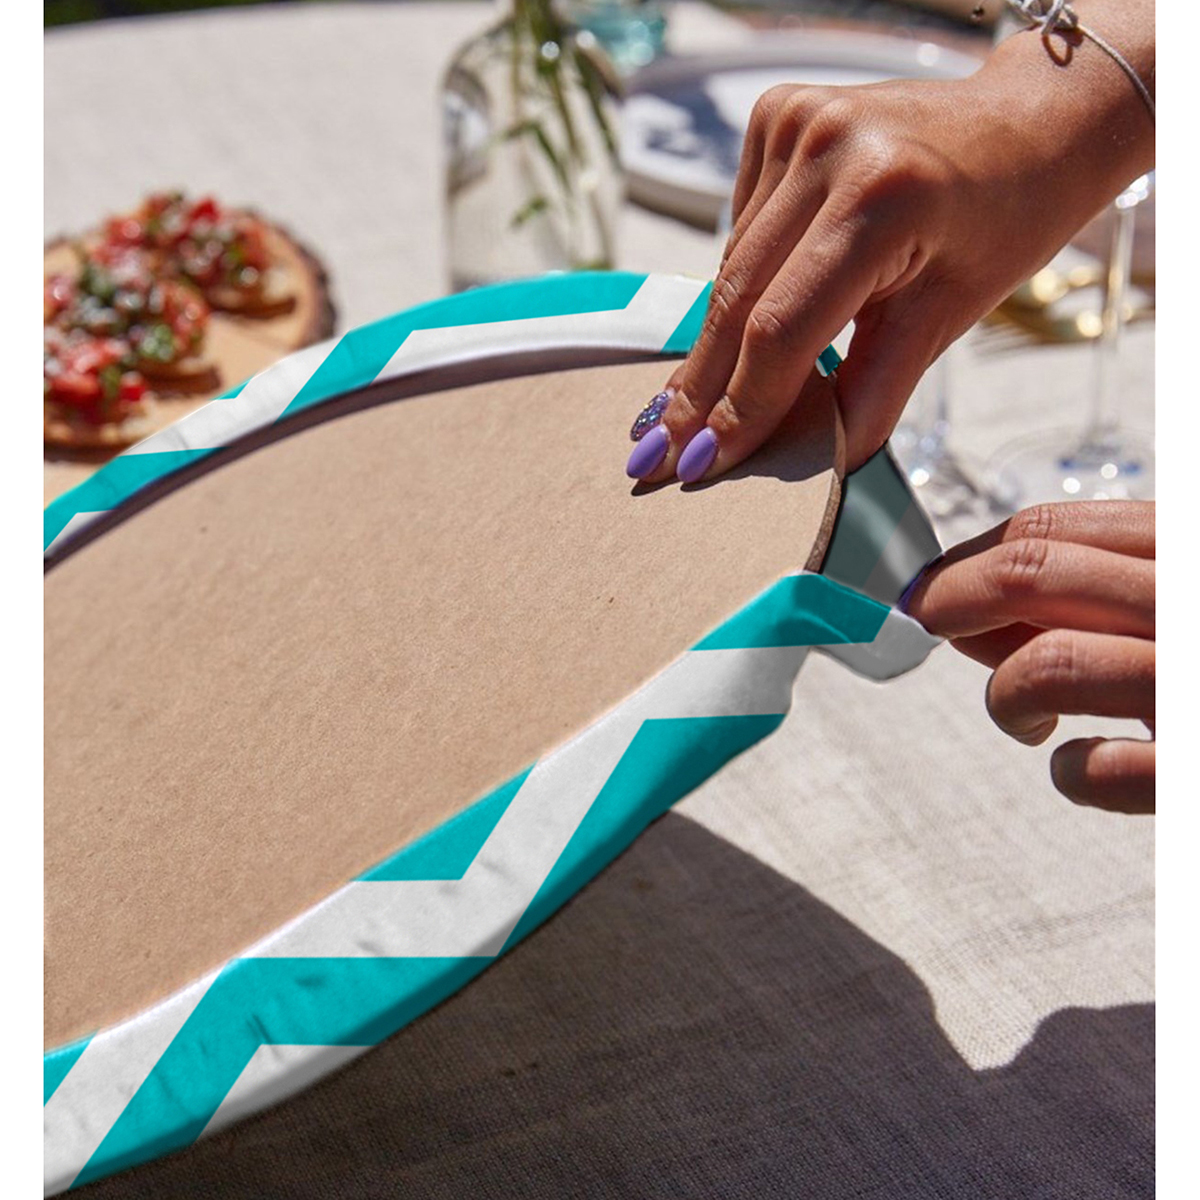 Realhomes Zigzag Desen Dijital Baskılı Modern 2'li Yuvarlak Servis Altlığı - Supla Realhomes